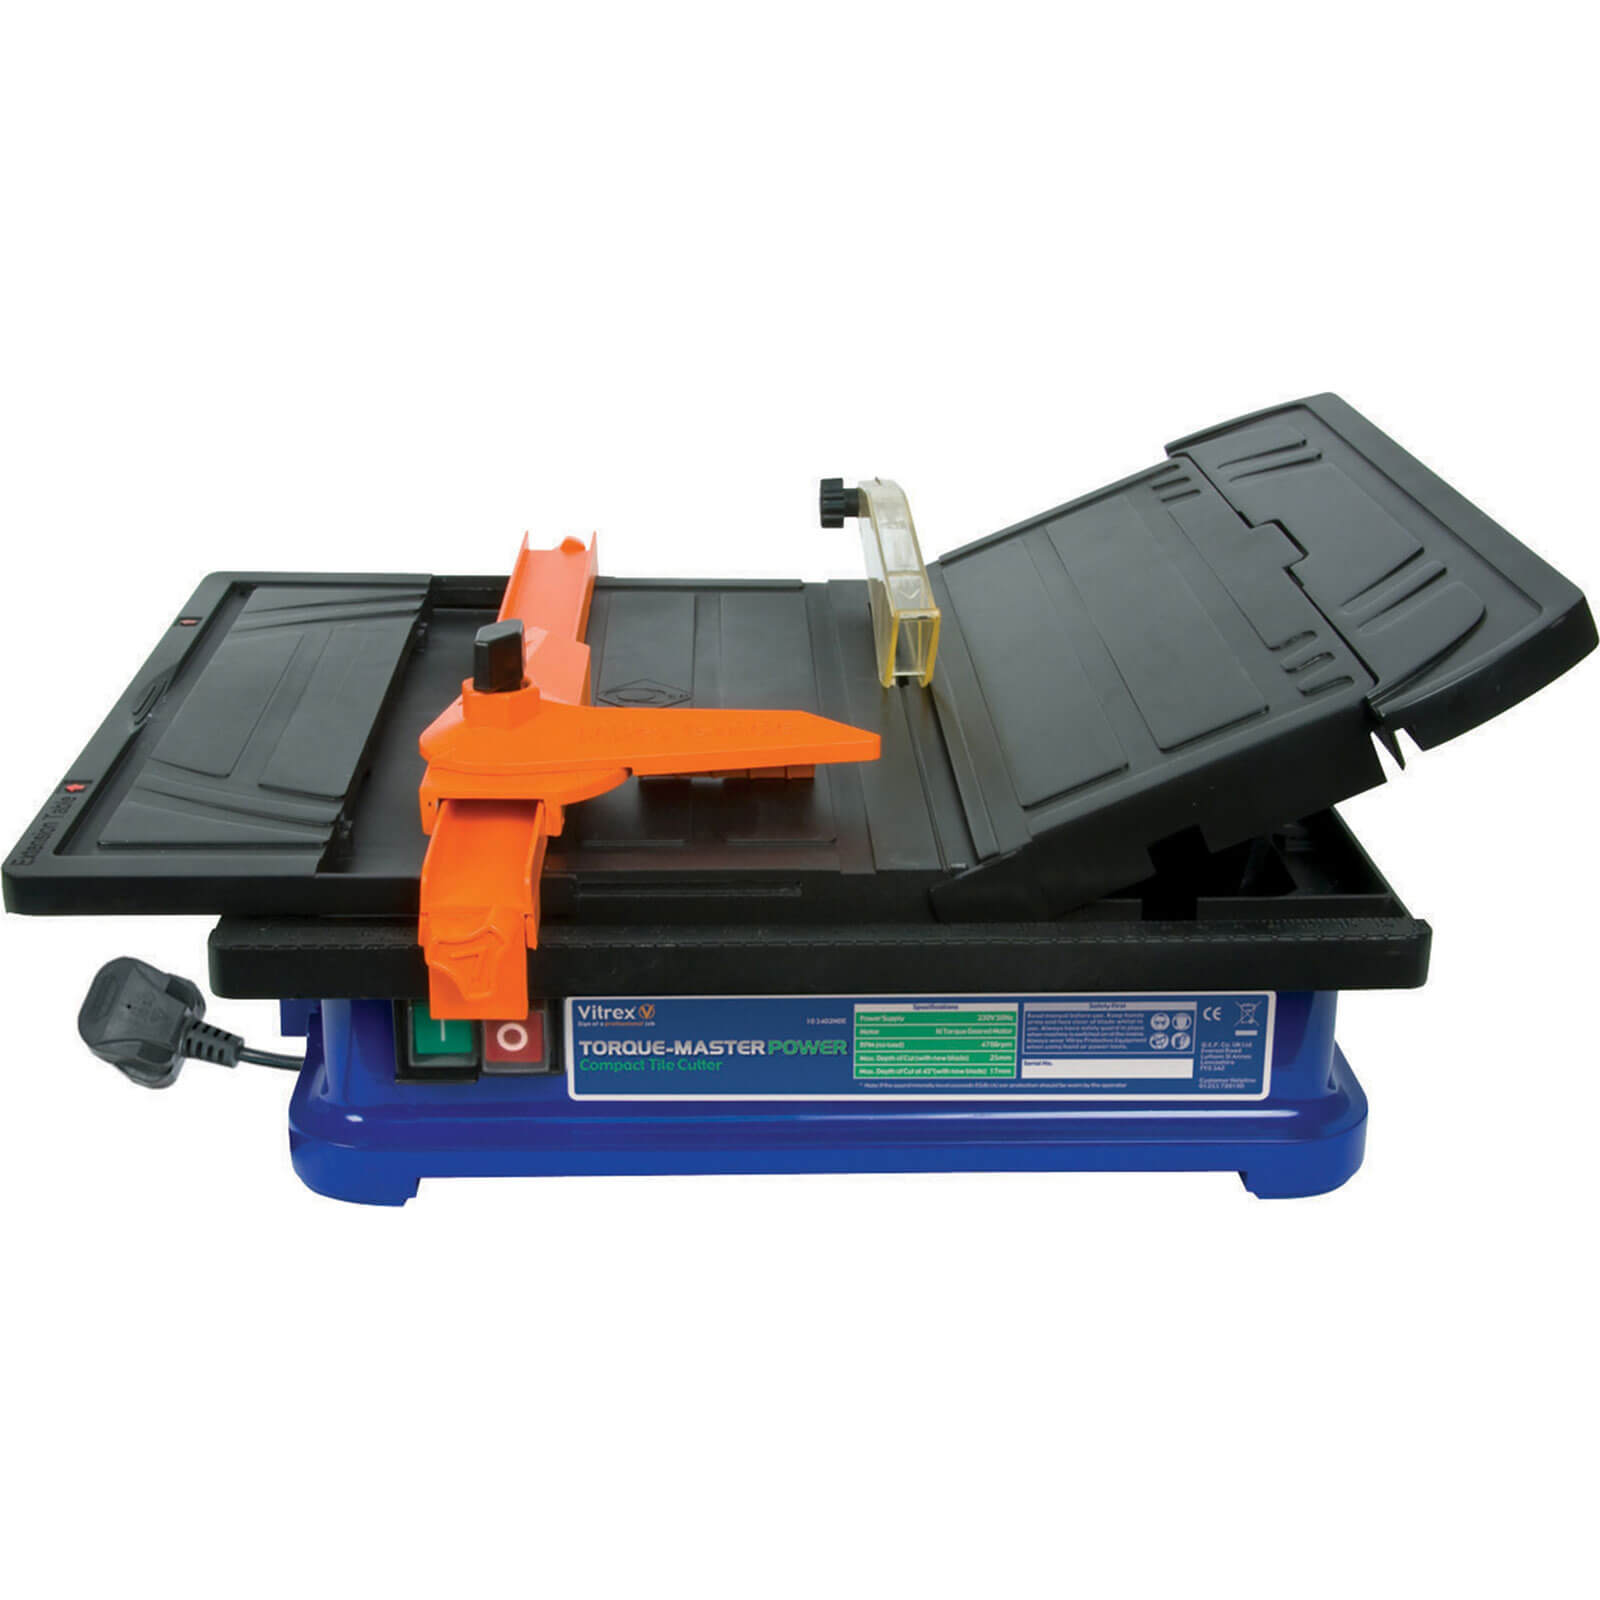 Vitrex Torque Master Power Tile Saw 110mm Blade 450w 240v